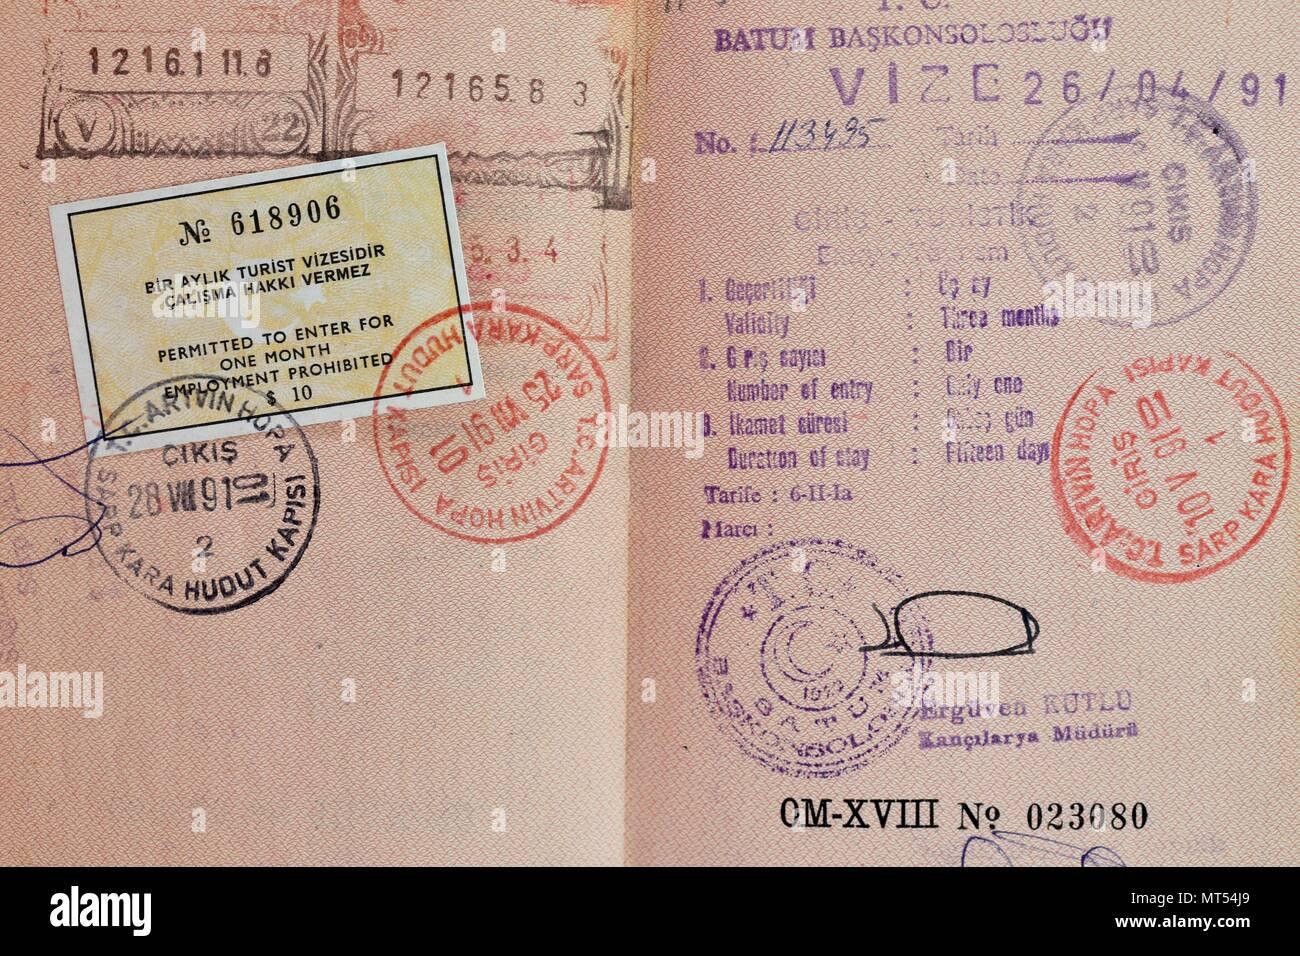 Passport Stock Photos & Passport Stock Images - Alamy